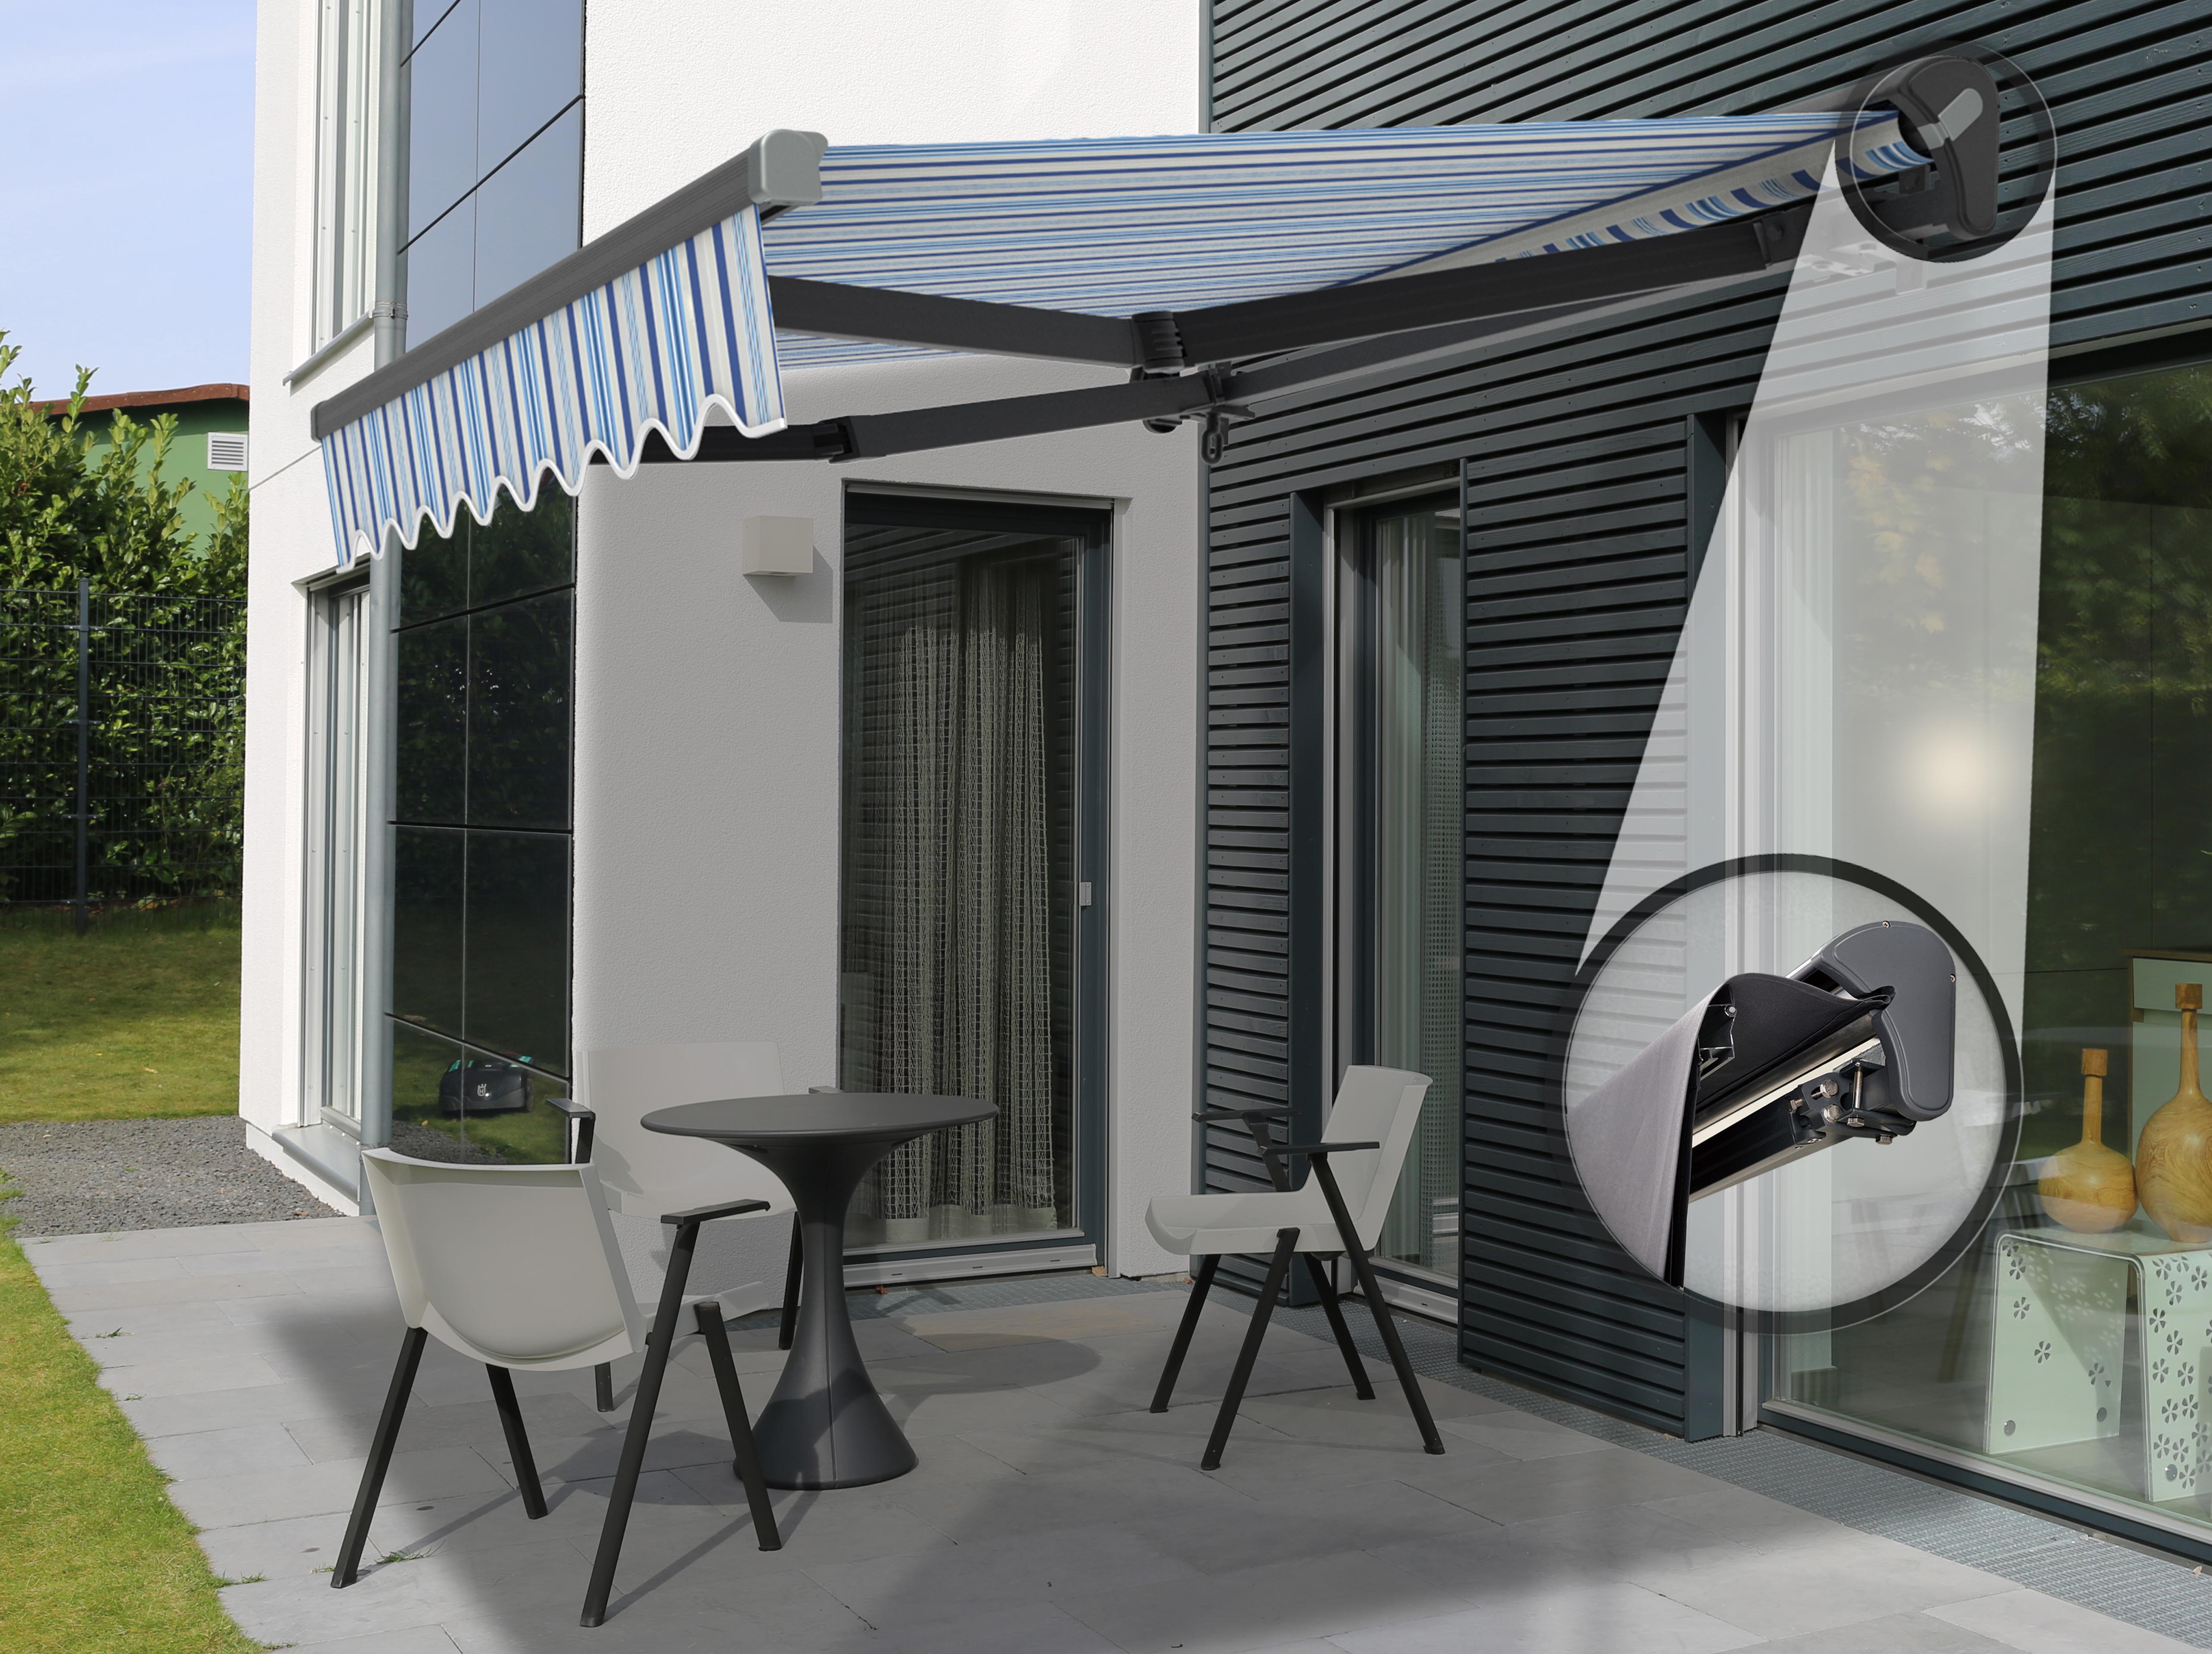 4m markise alu markise halbkassette stofftaustauschbar. Black Bedroom Furniture Sets. Home Design Ideas